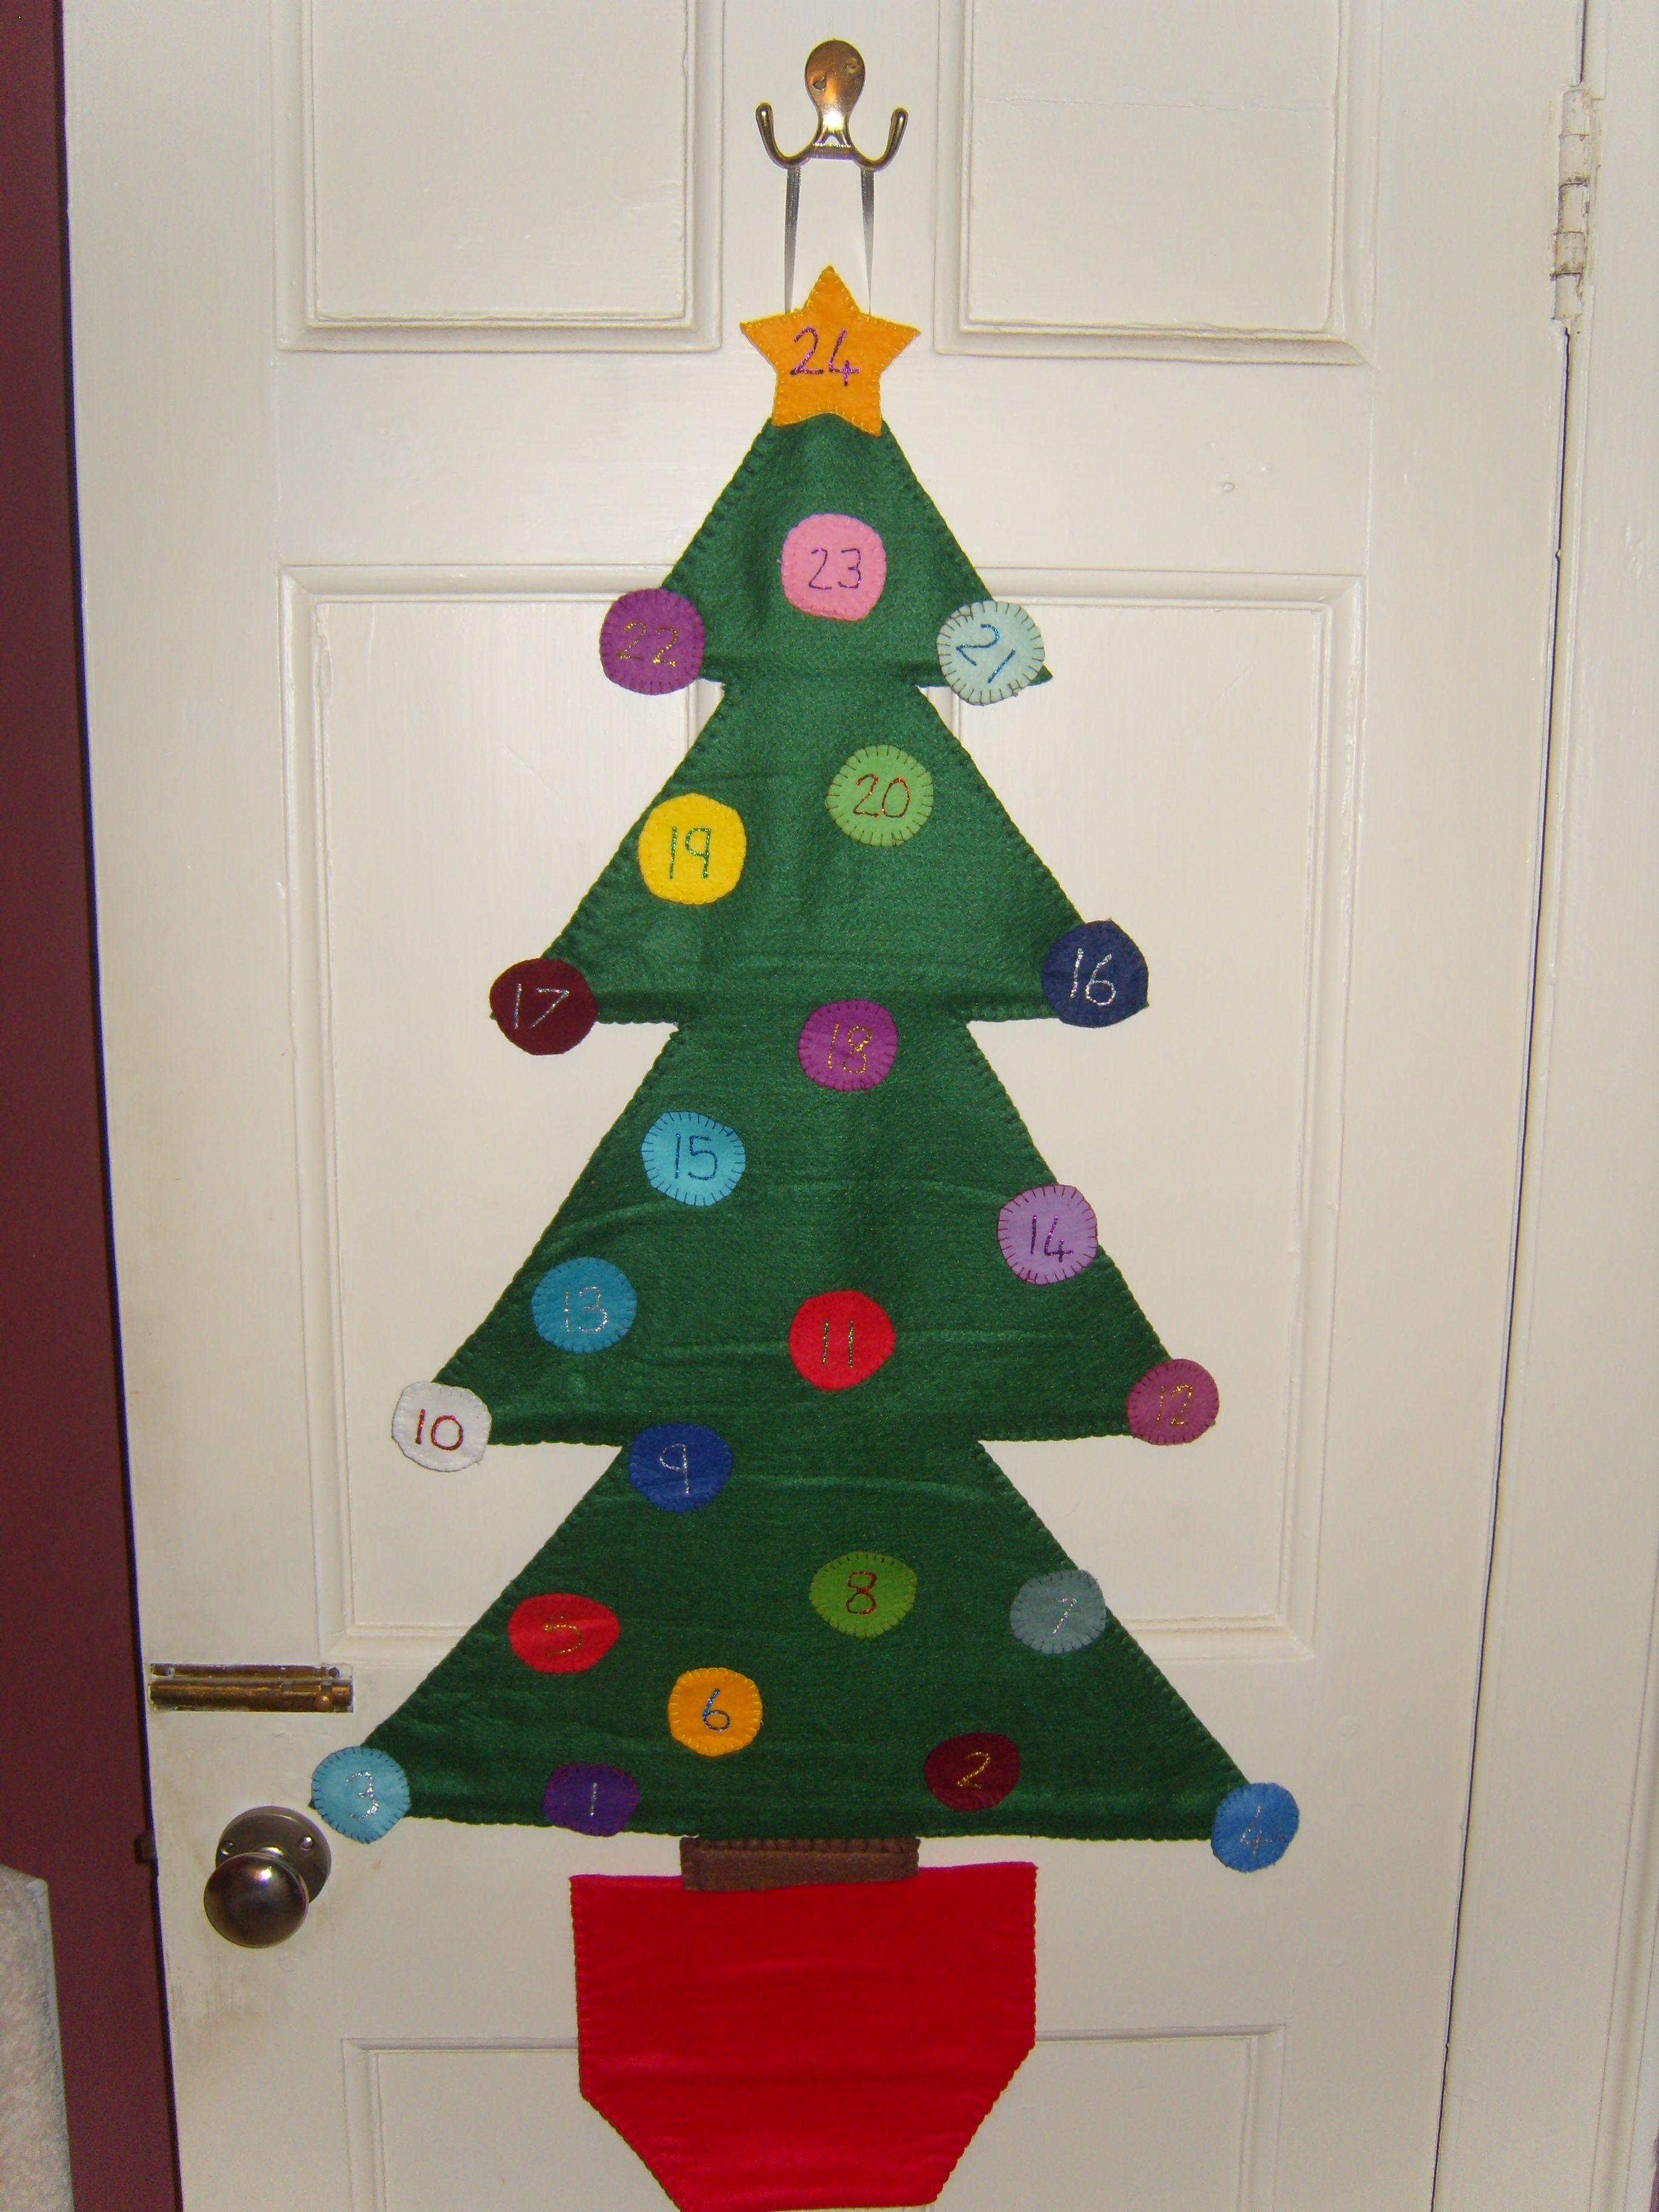 Felt Christmas Tree Advent Calendar I Made For My Twins